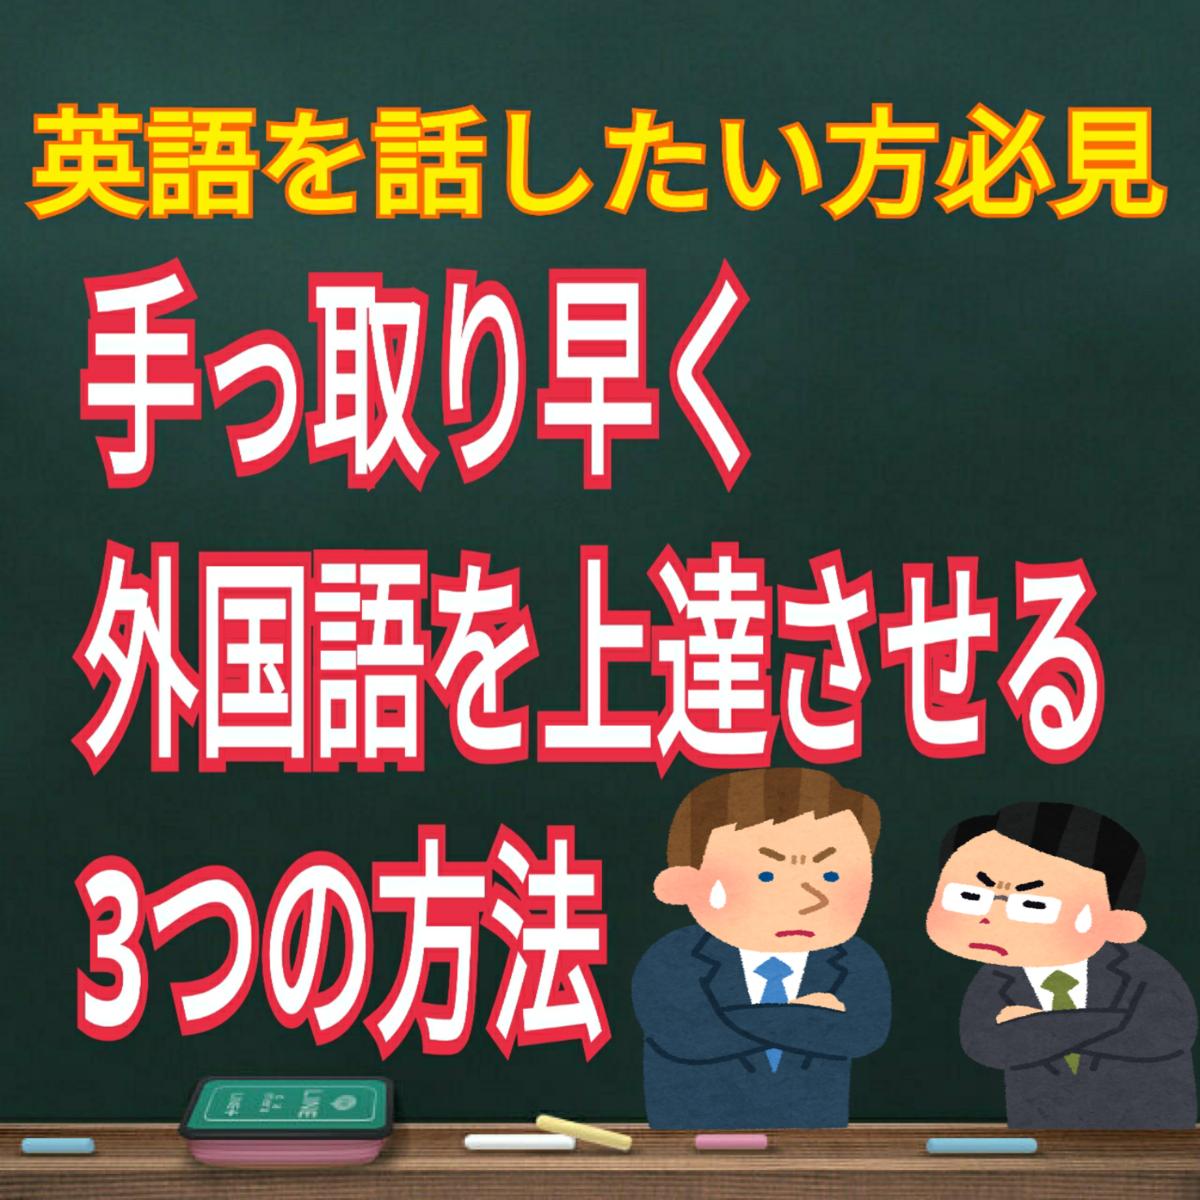 f:id:nojima_blog:20190627215456p:plain